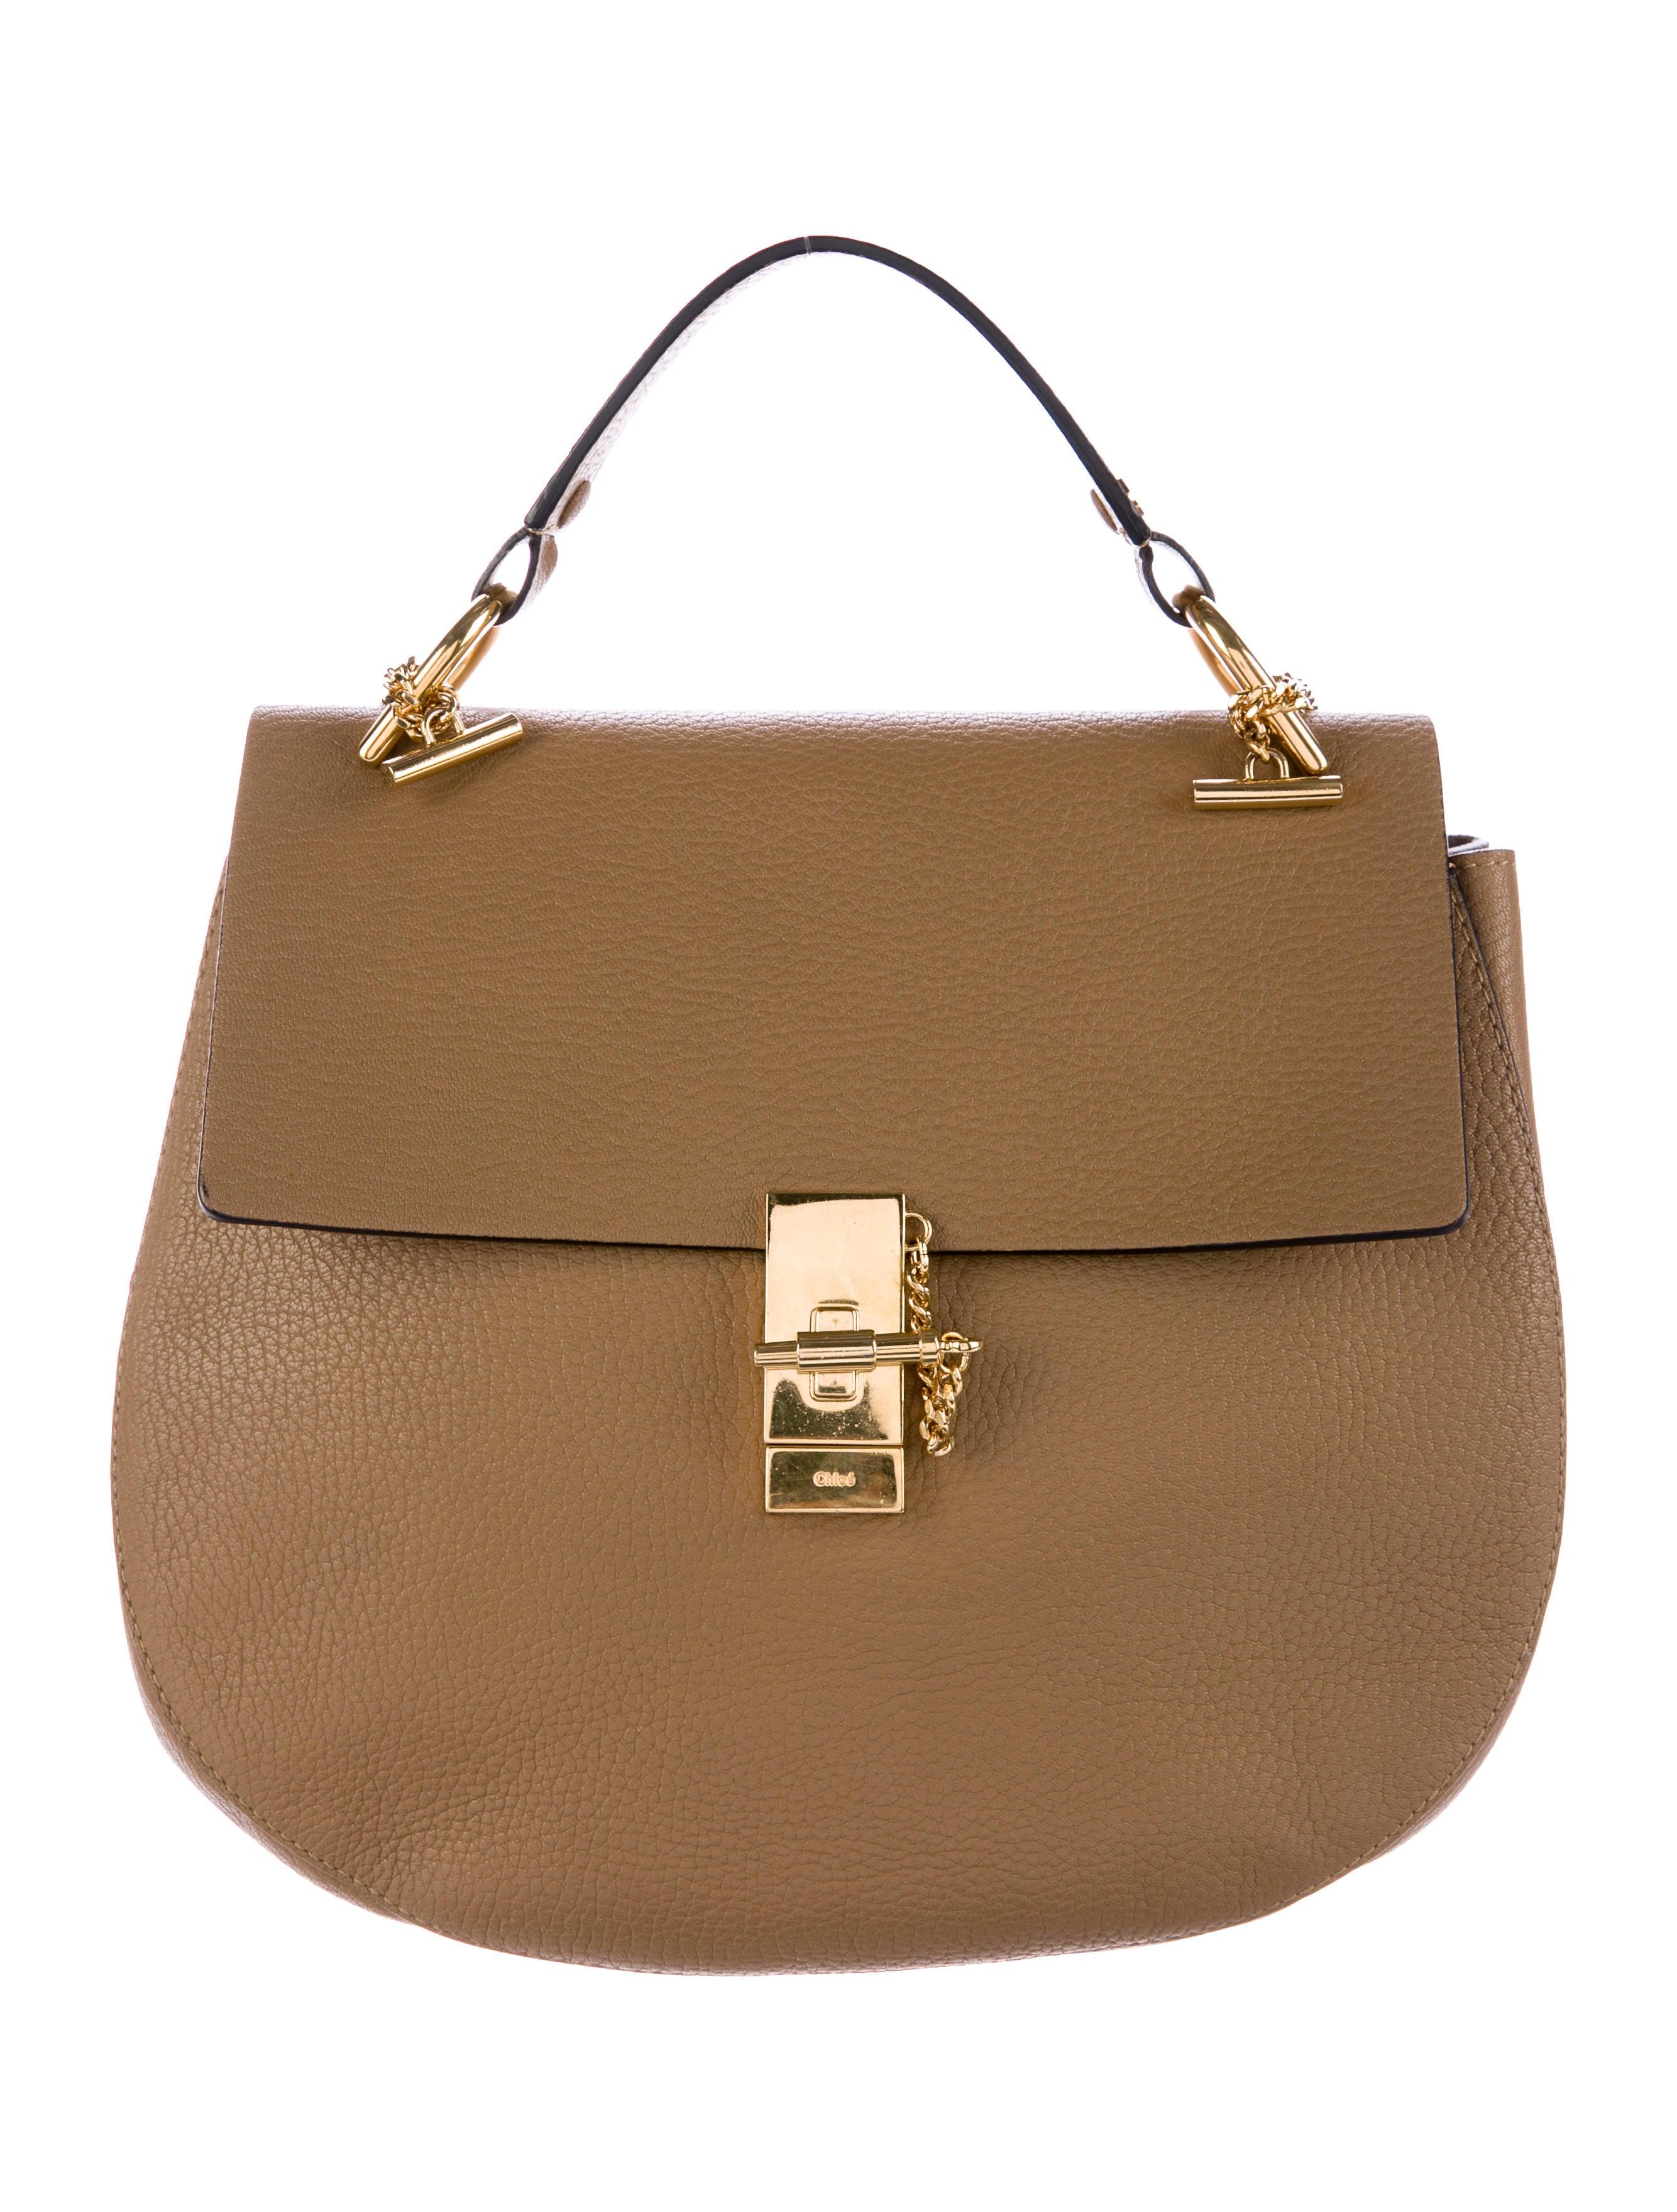 chlo large drew bag handbags chl60562 the realreal. Black Bedroom Furniture Sets. Home Design Ideas